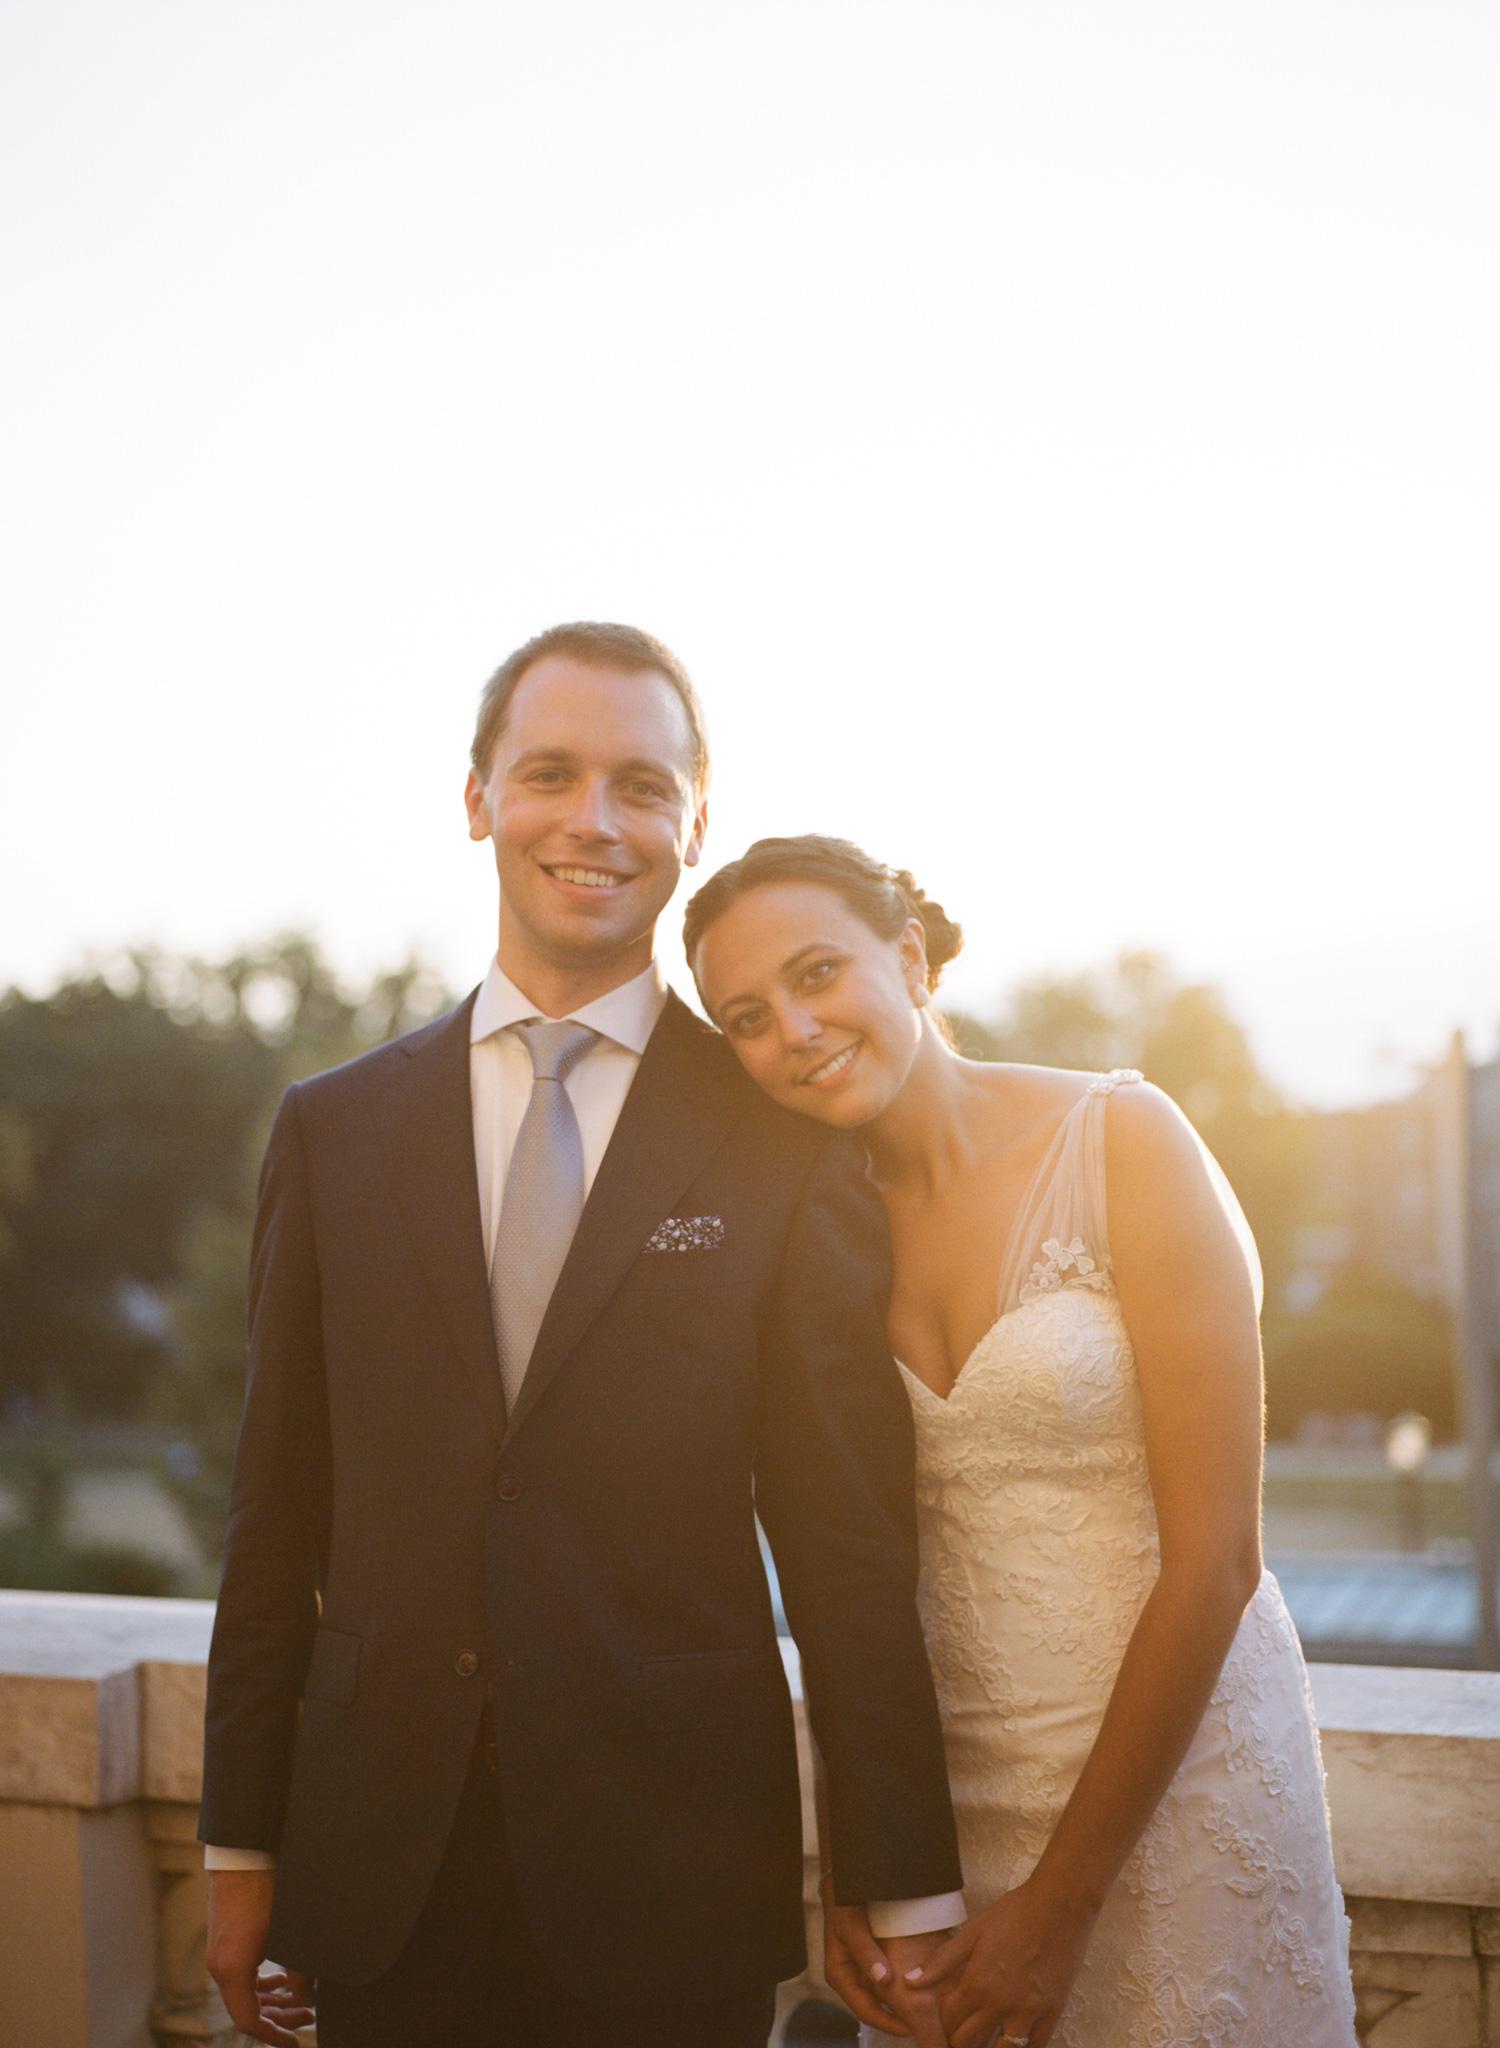 660-washington-dc-film-wedding-photographer.jpg